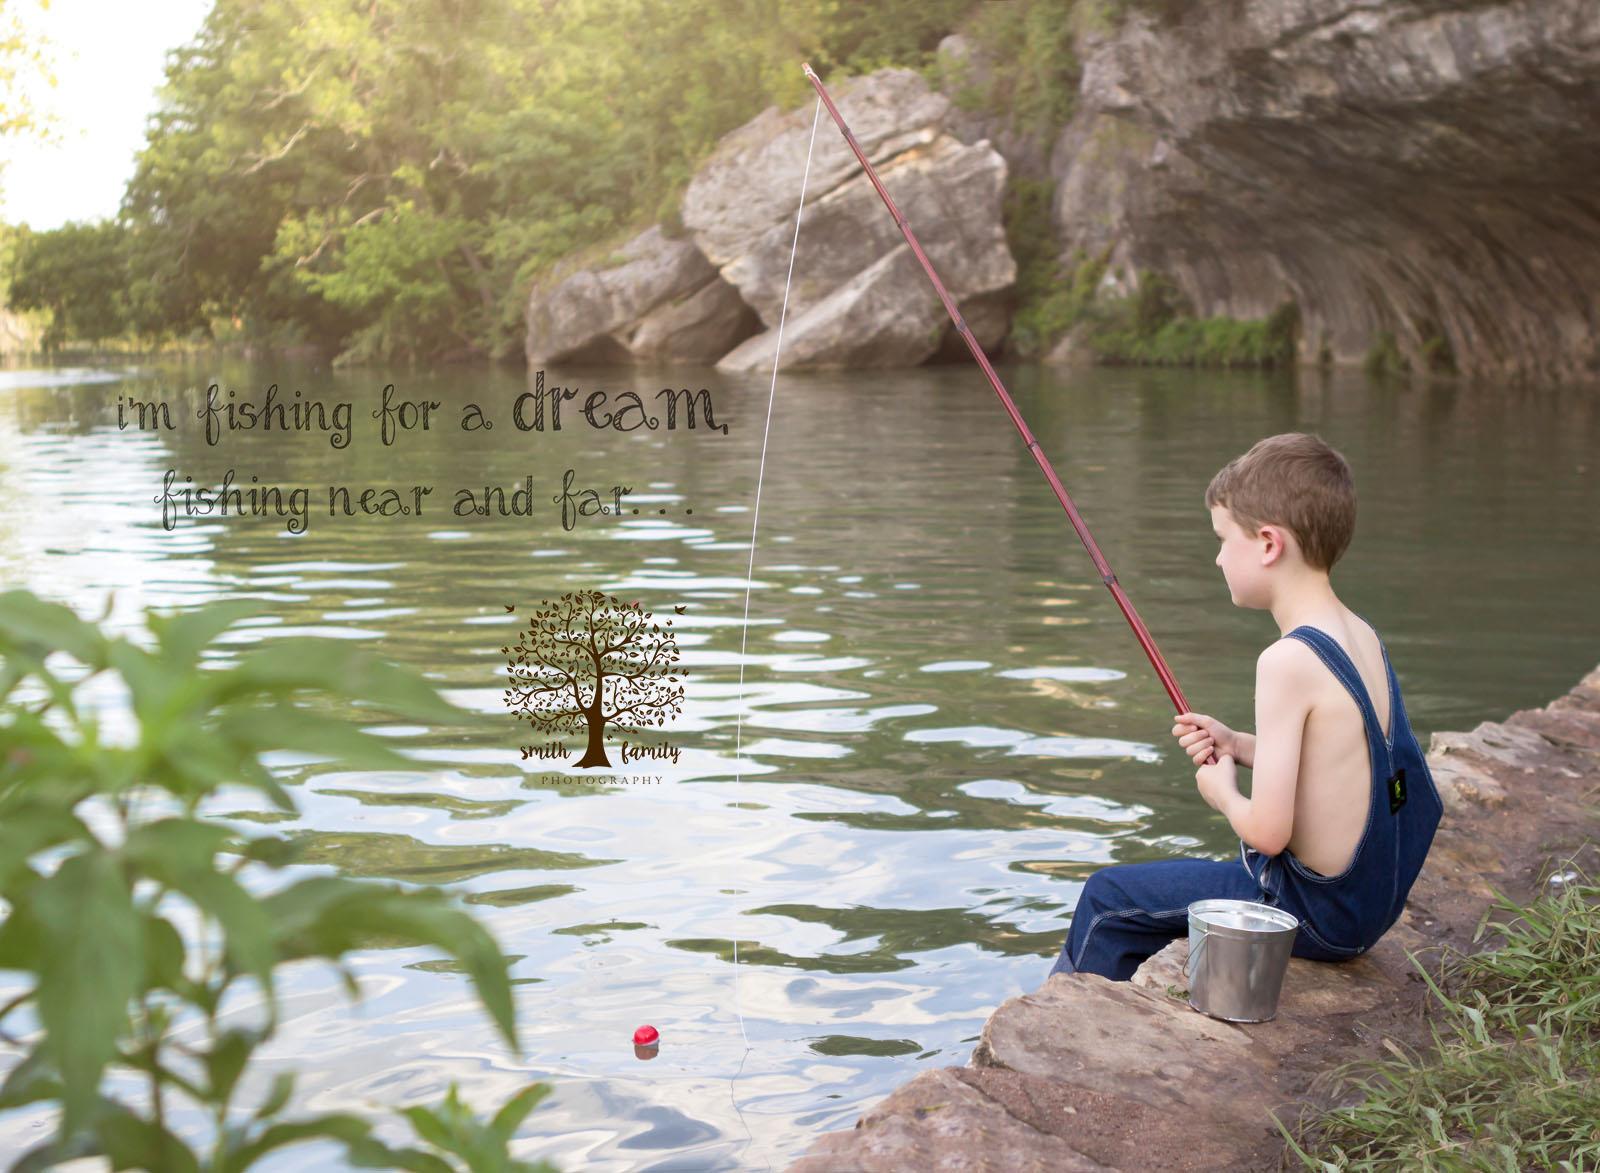 huckleberry_finn_fishing_photograph_smith_family_photography_waco